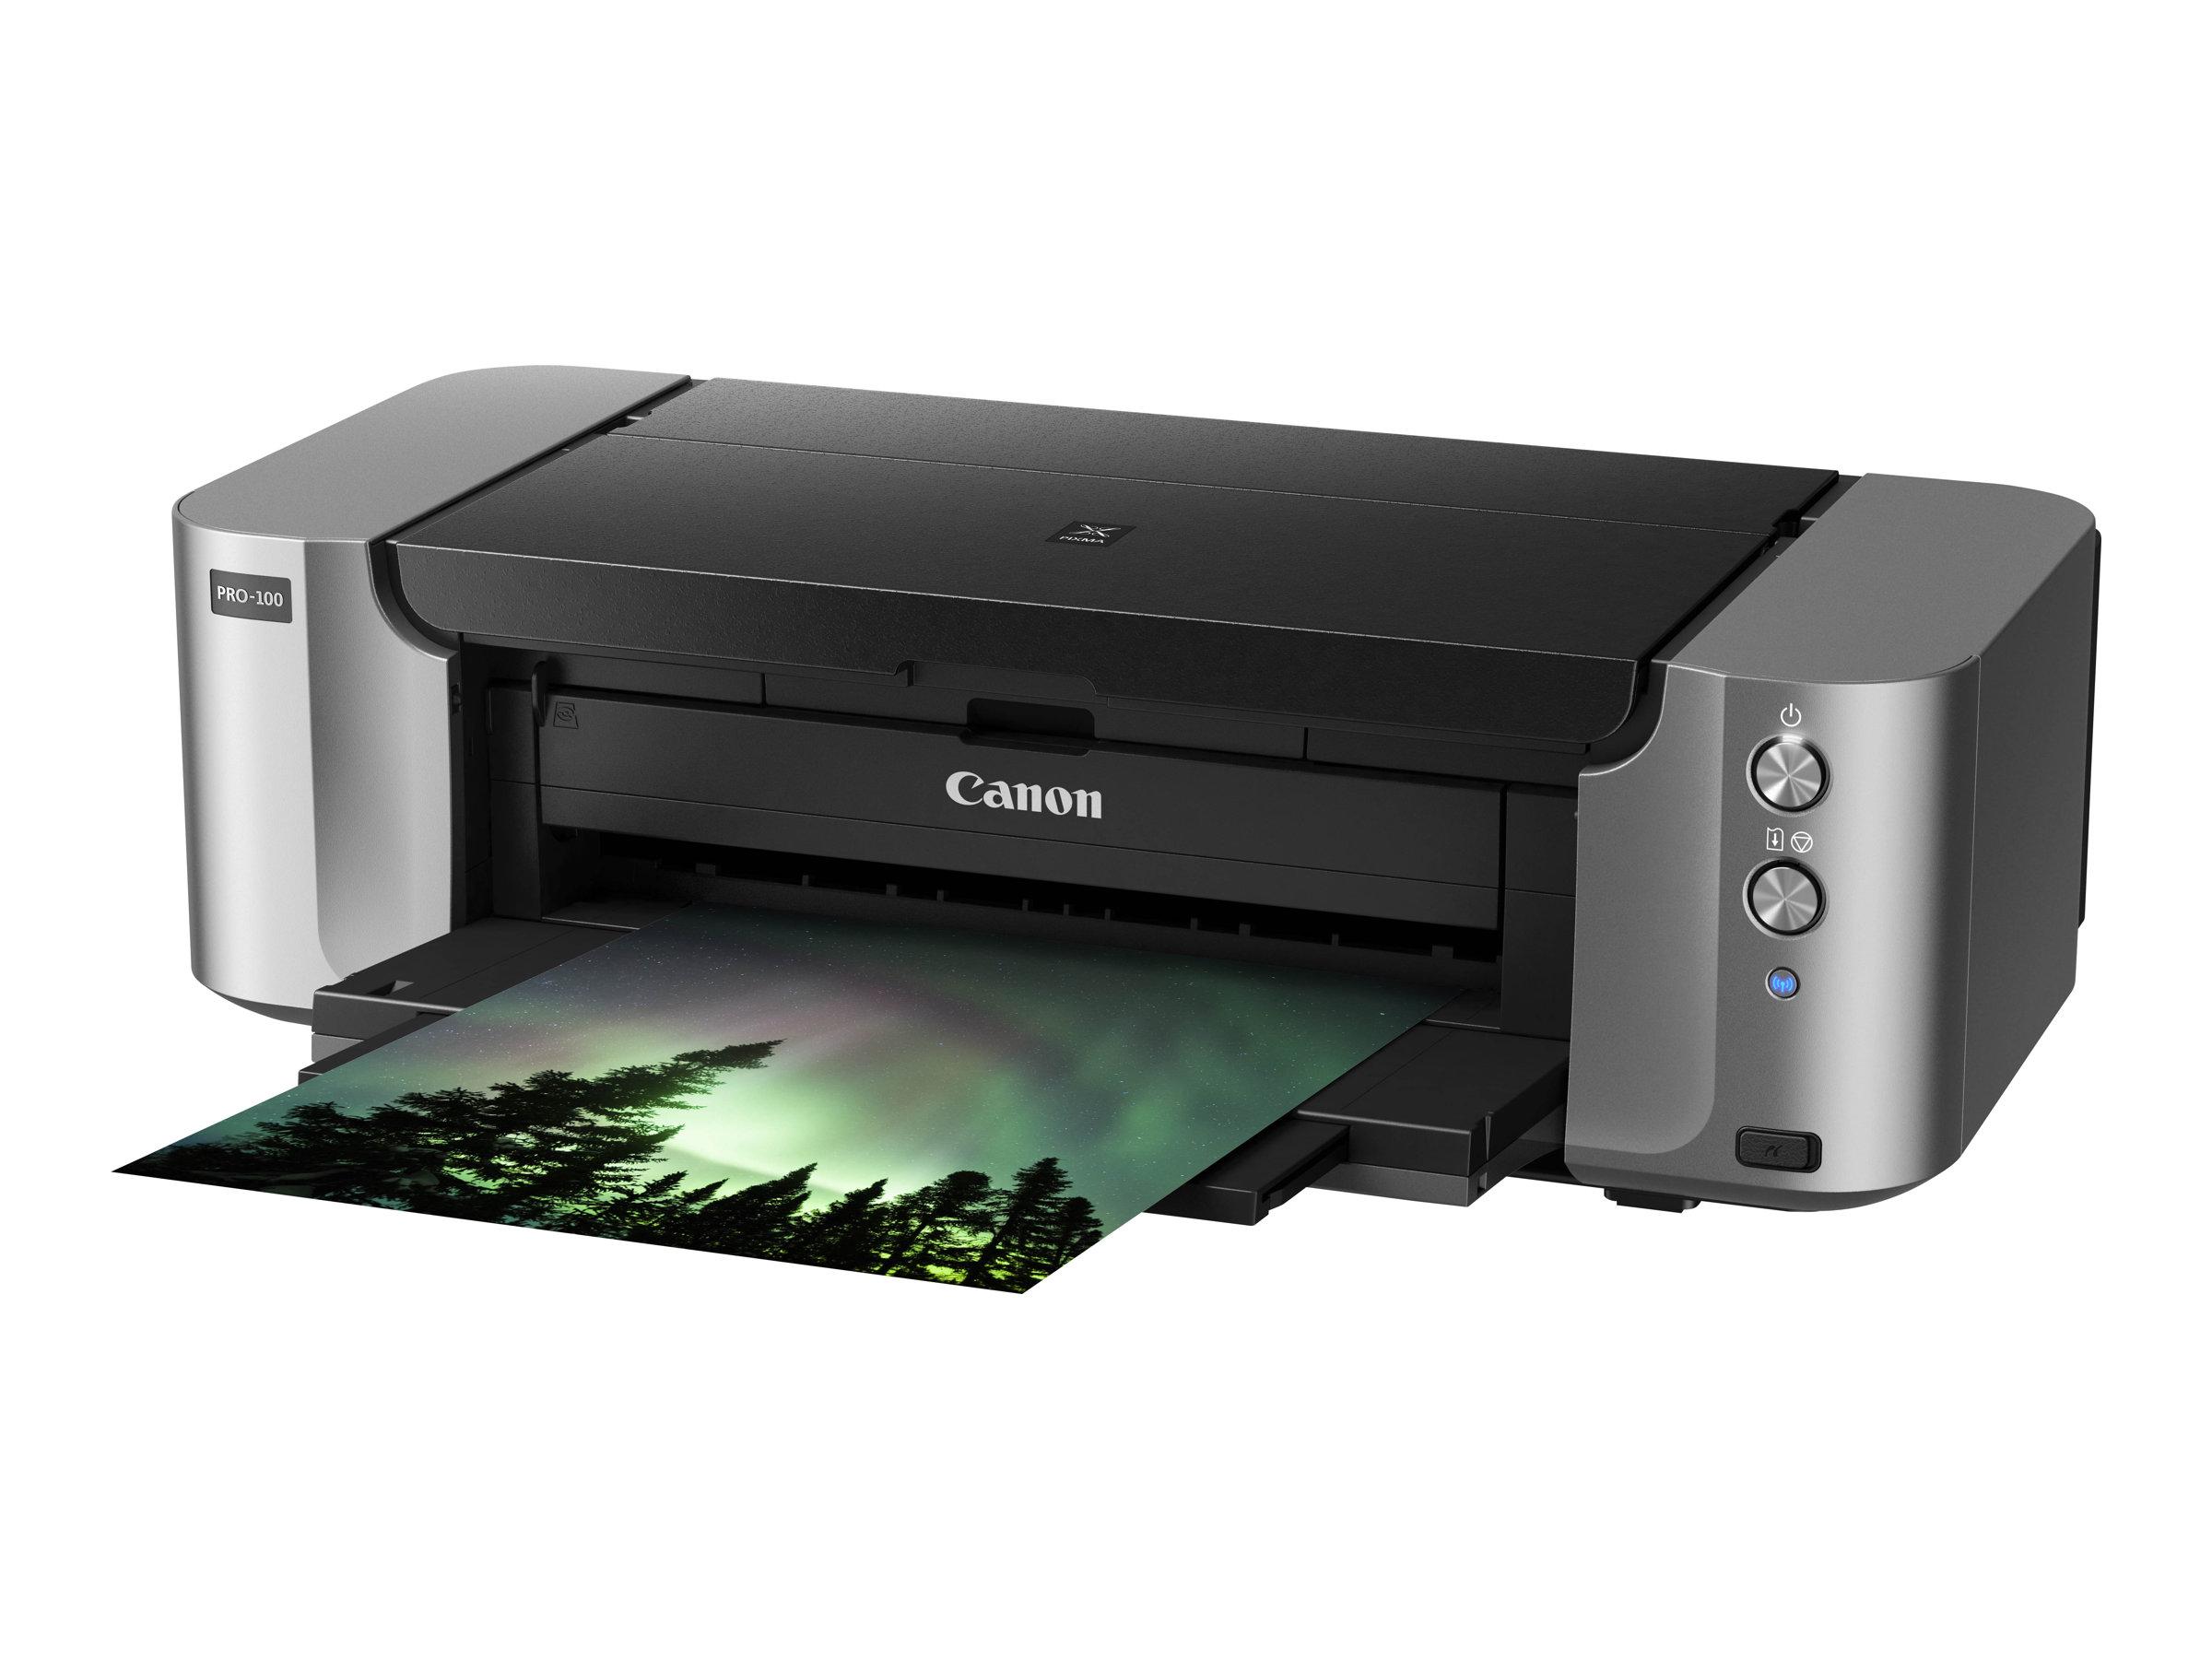 Canon PIXMA PRO-100S - Drucker - Farbe - Tintenstrahl - A3 Plus, 360 x 430 mm bis zu 1.5 Min./Seite (Farbe)